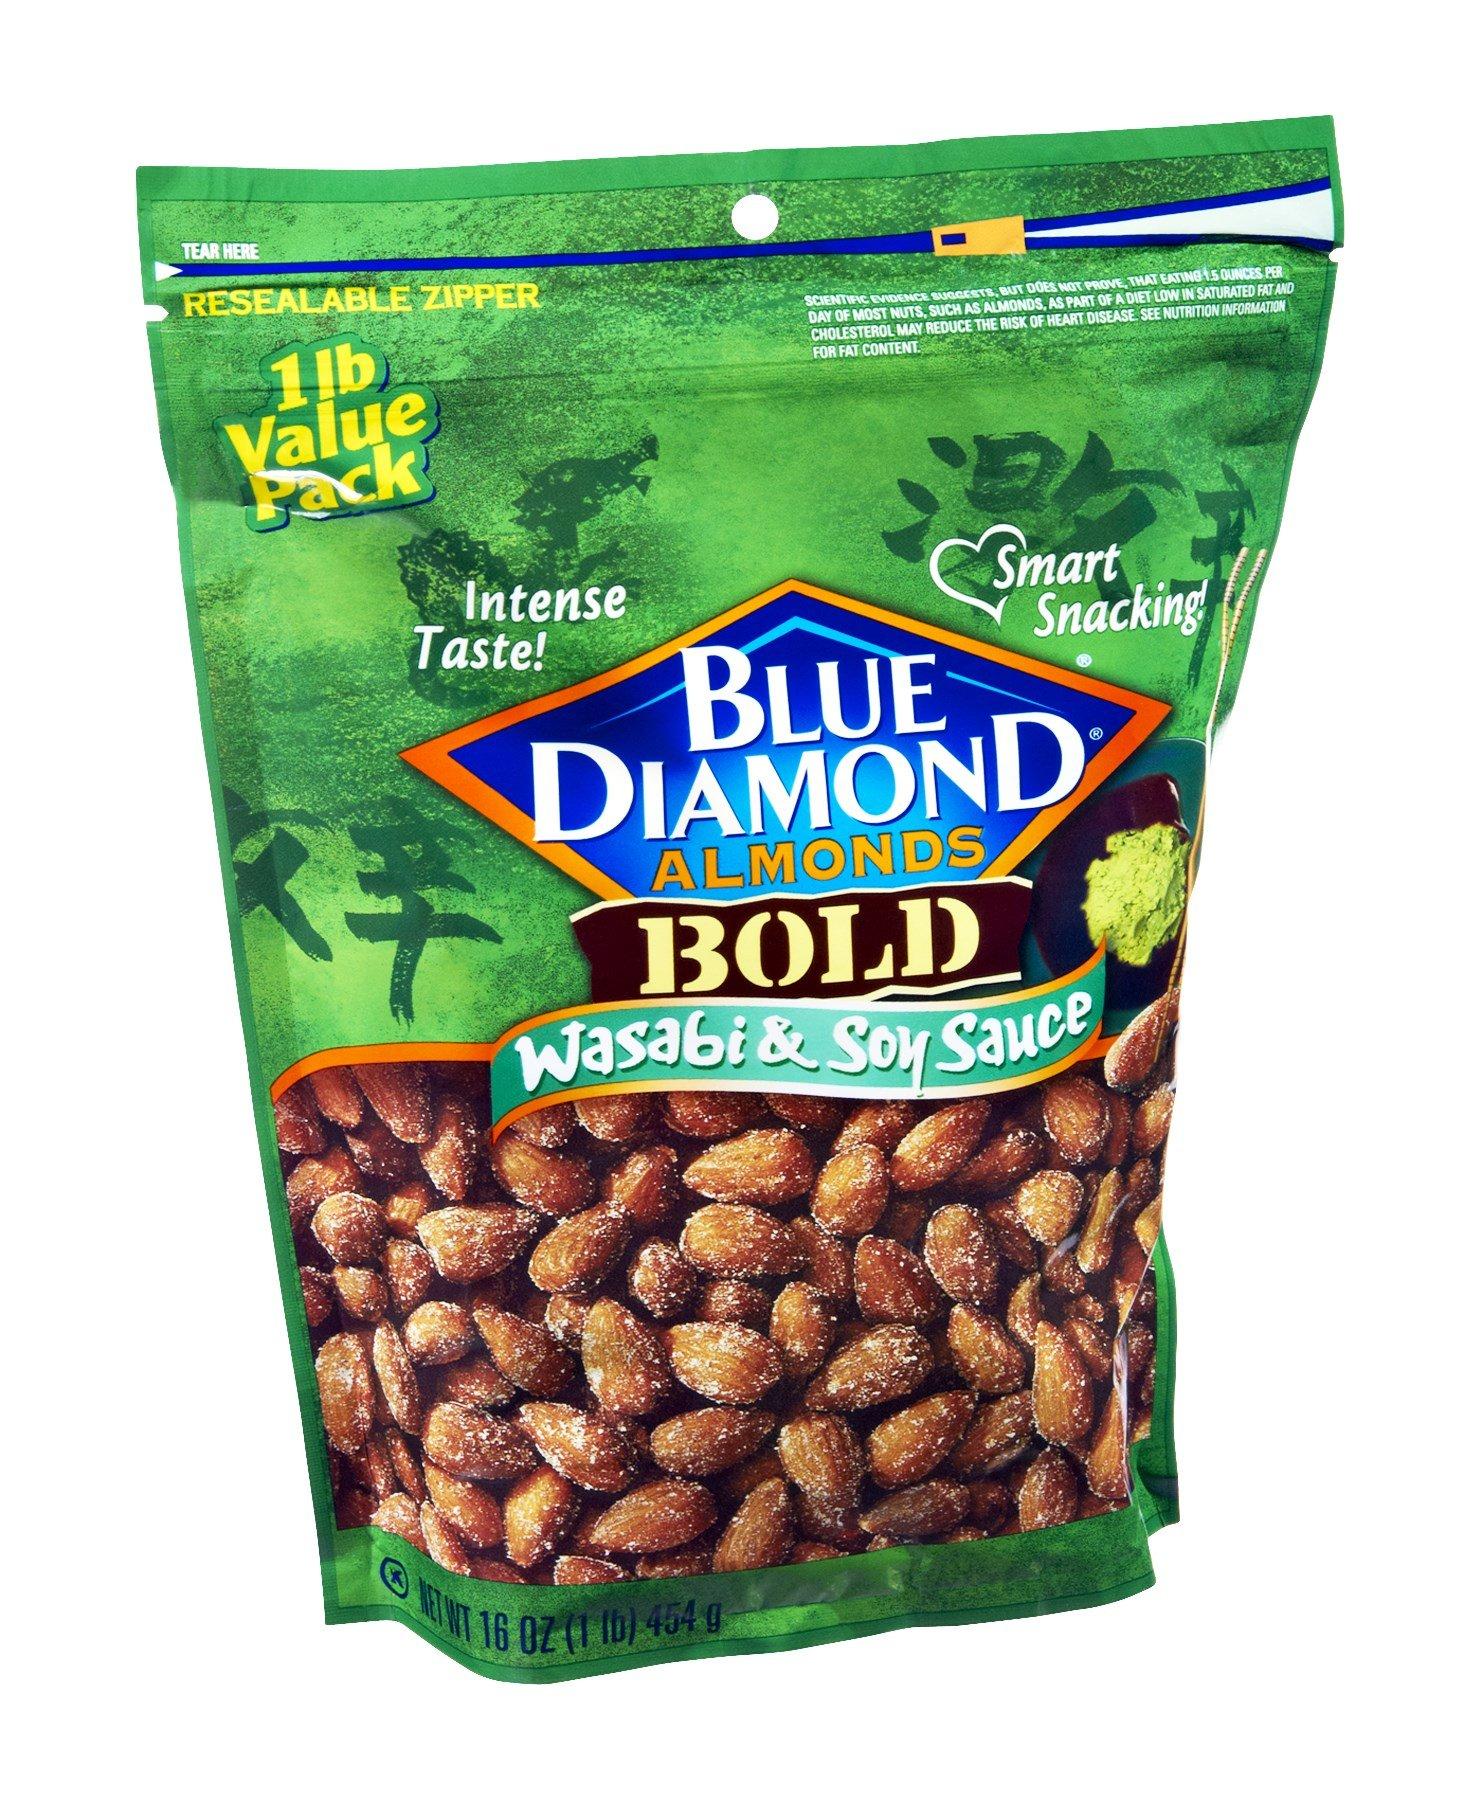 Blue Diamond Bold Wasabi & Soy Sauce Almonds 16 OZ (Pack of 12)